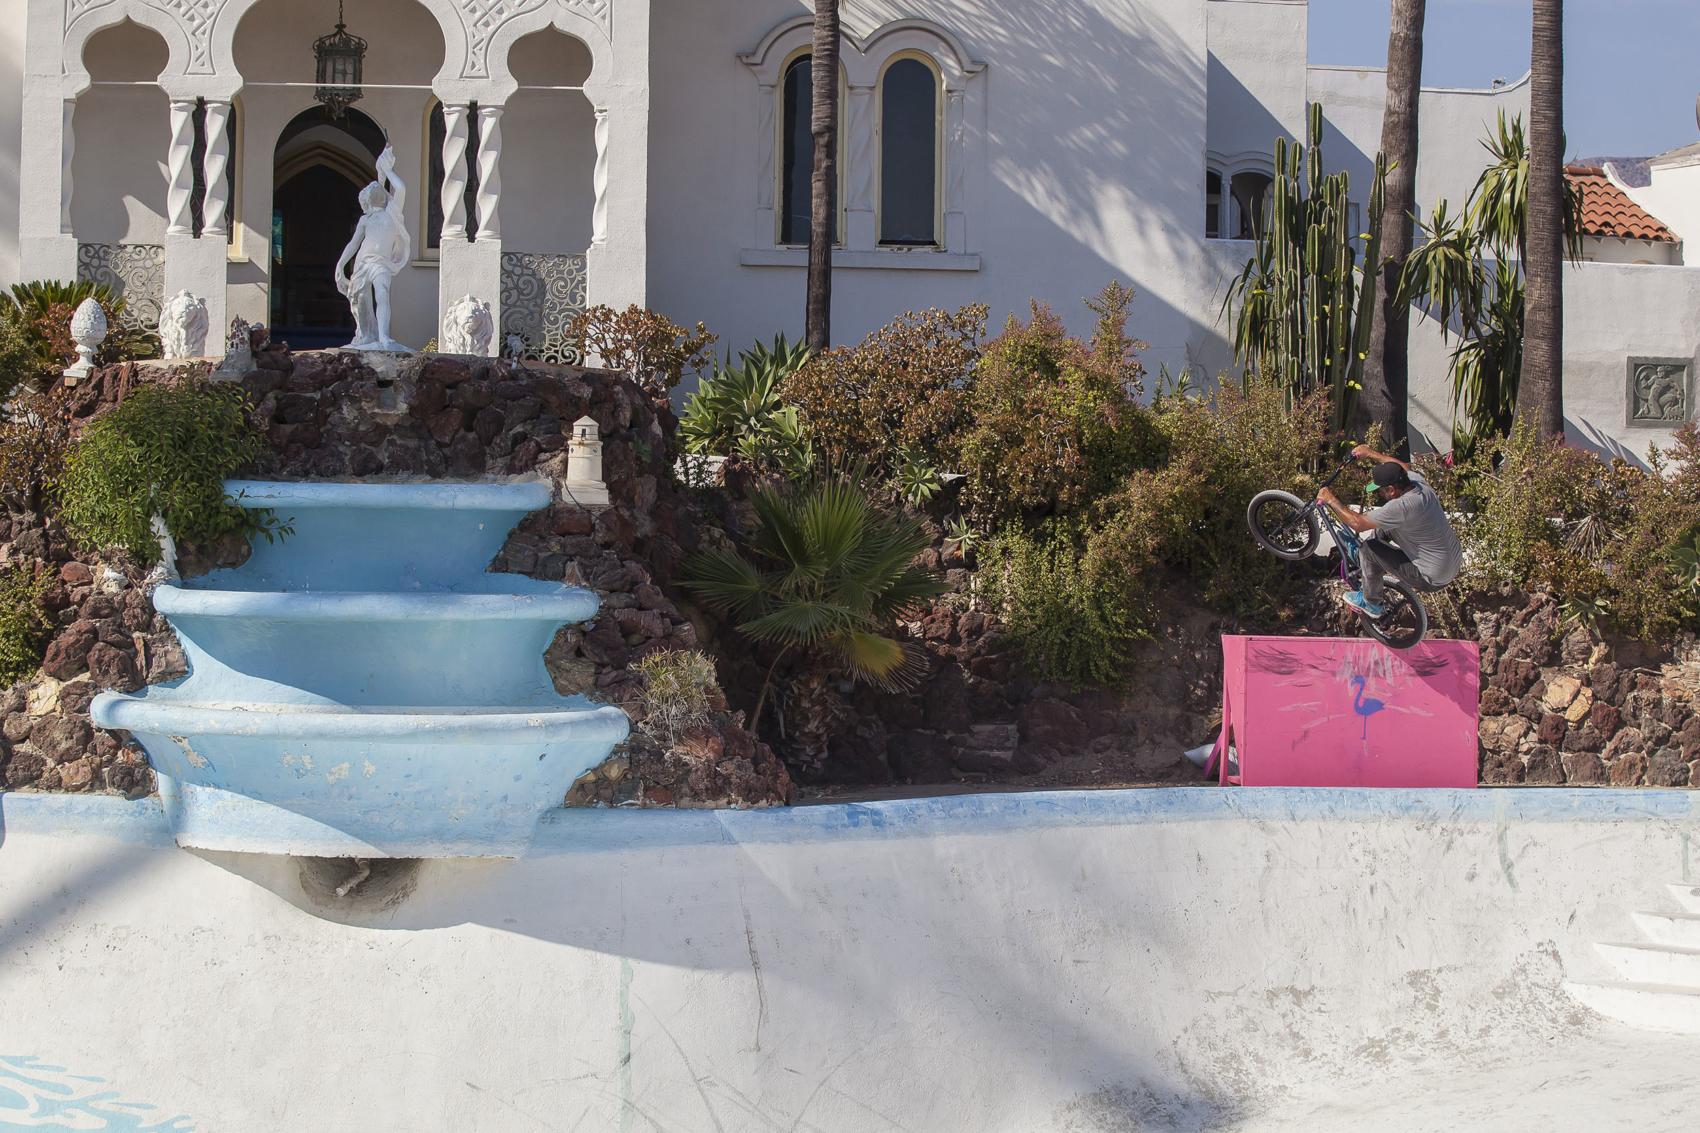 rooftop_pool_s-roofanu-luna